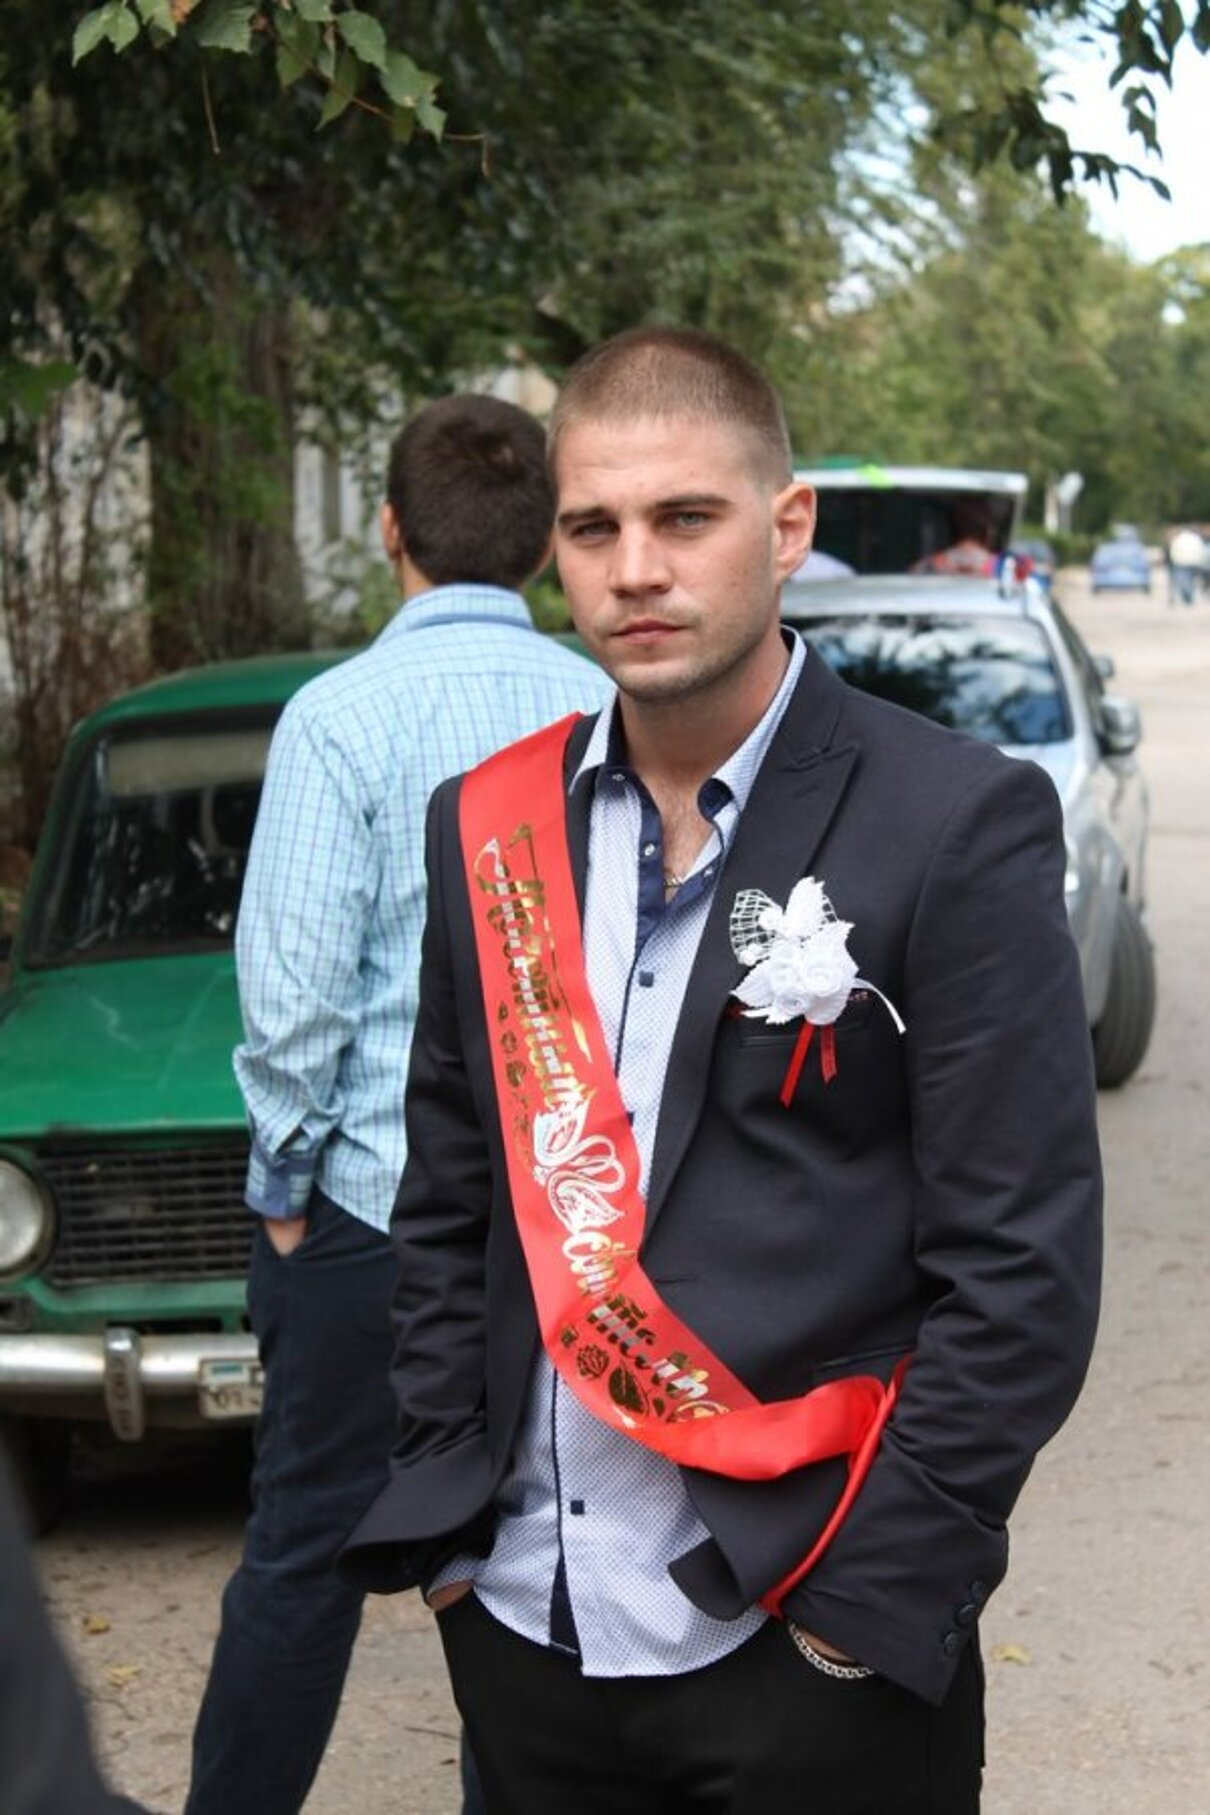 Жалоба-отзыв: Василий галушка - Мошенник